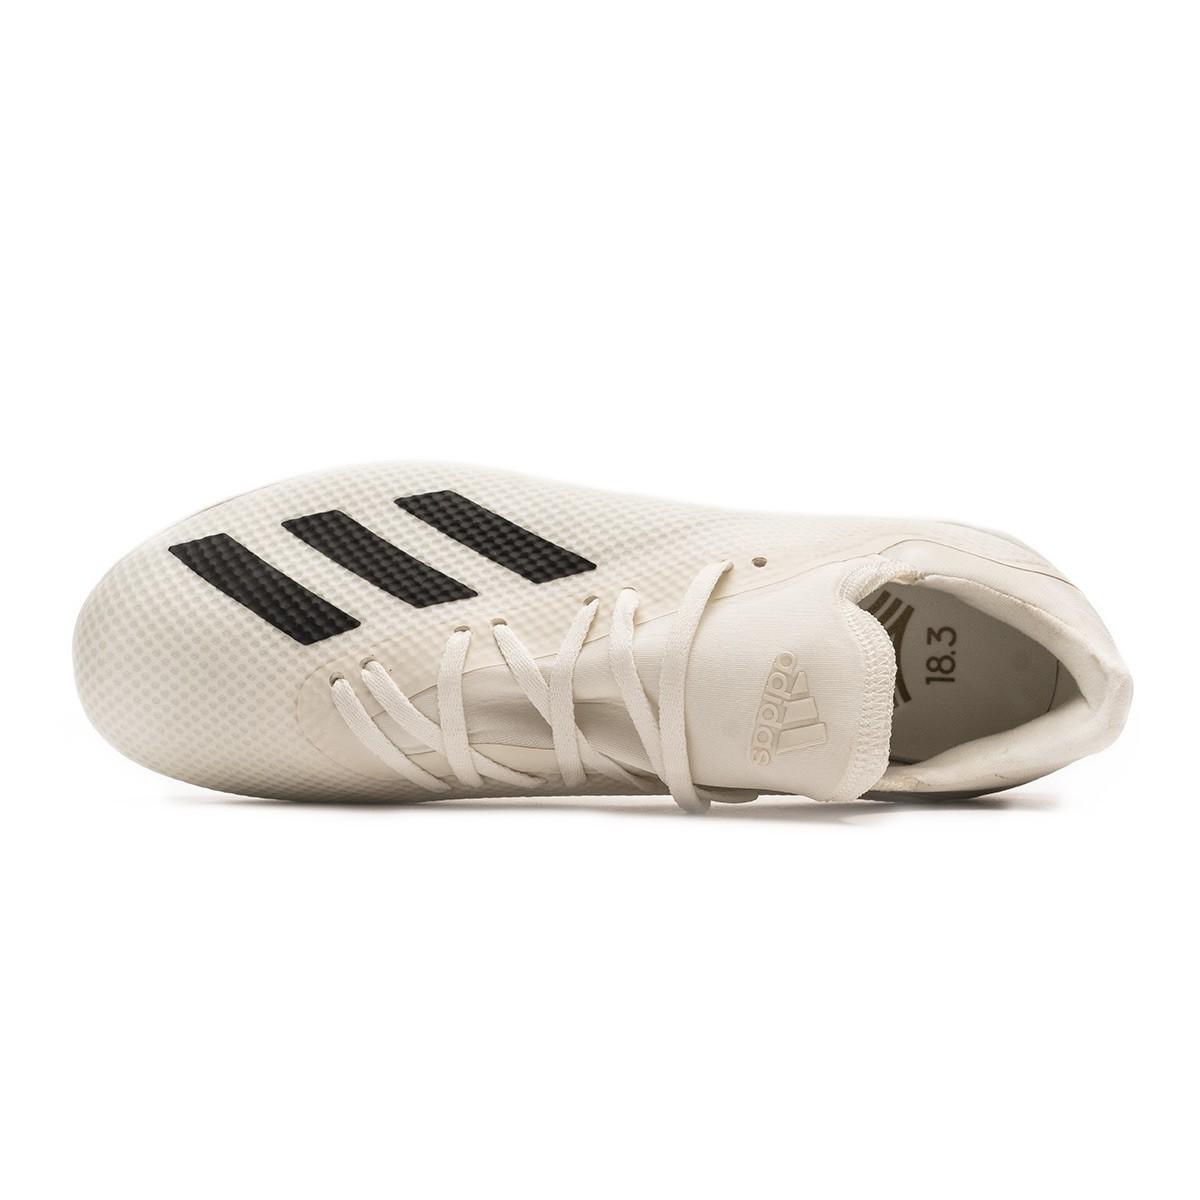 ac784c96b Football Boot adidas X Tango 18.3 Turf Off white-Core black-White - Football  store Fútbol Emotion